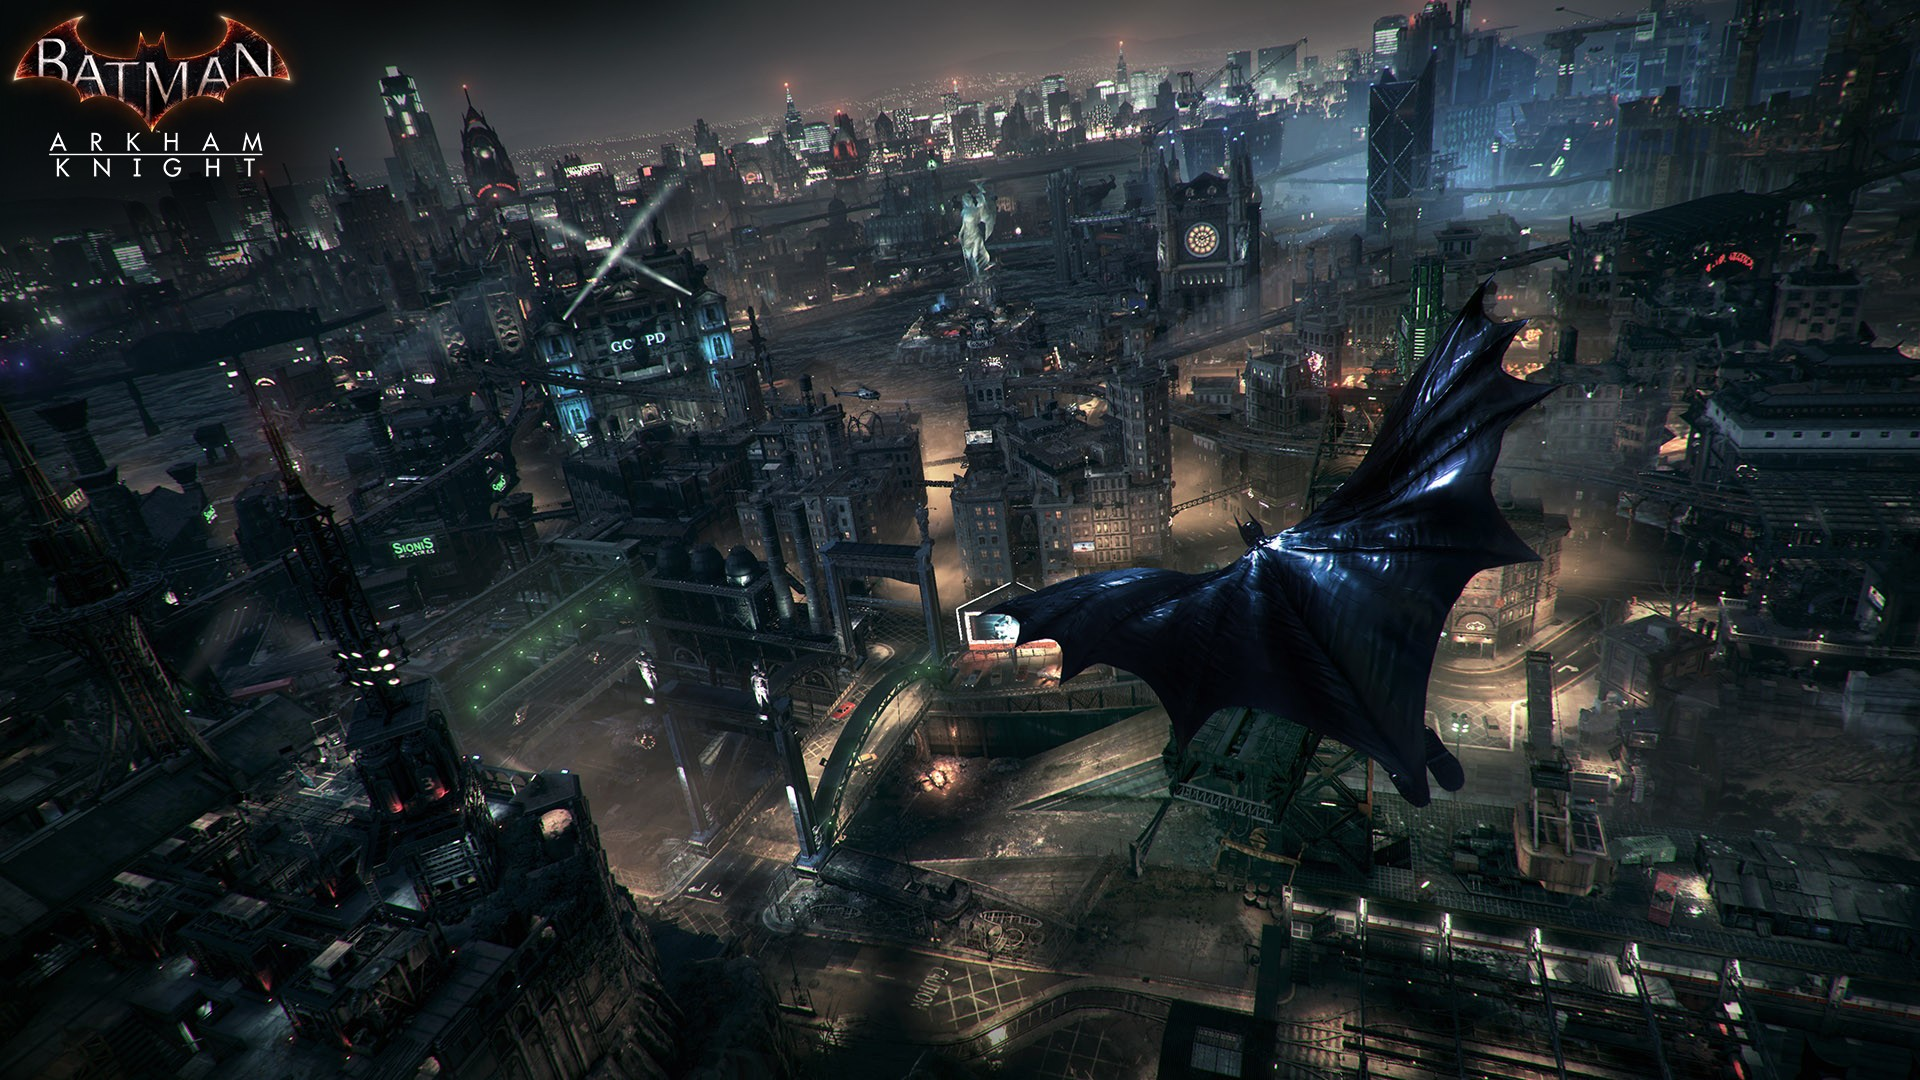 Batman-Arkham-Knight-Backgrounds.jpg